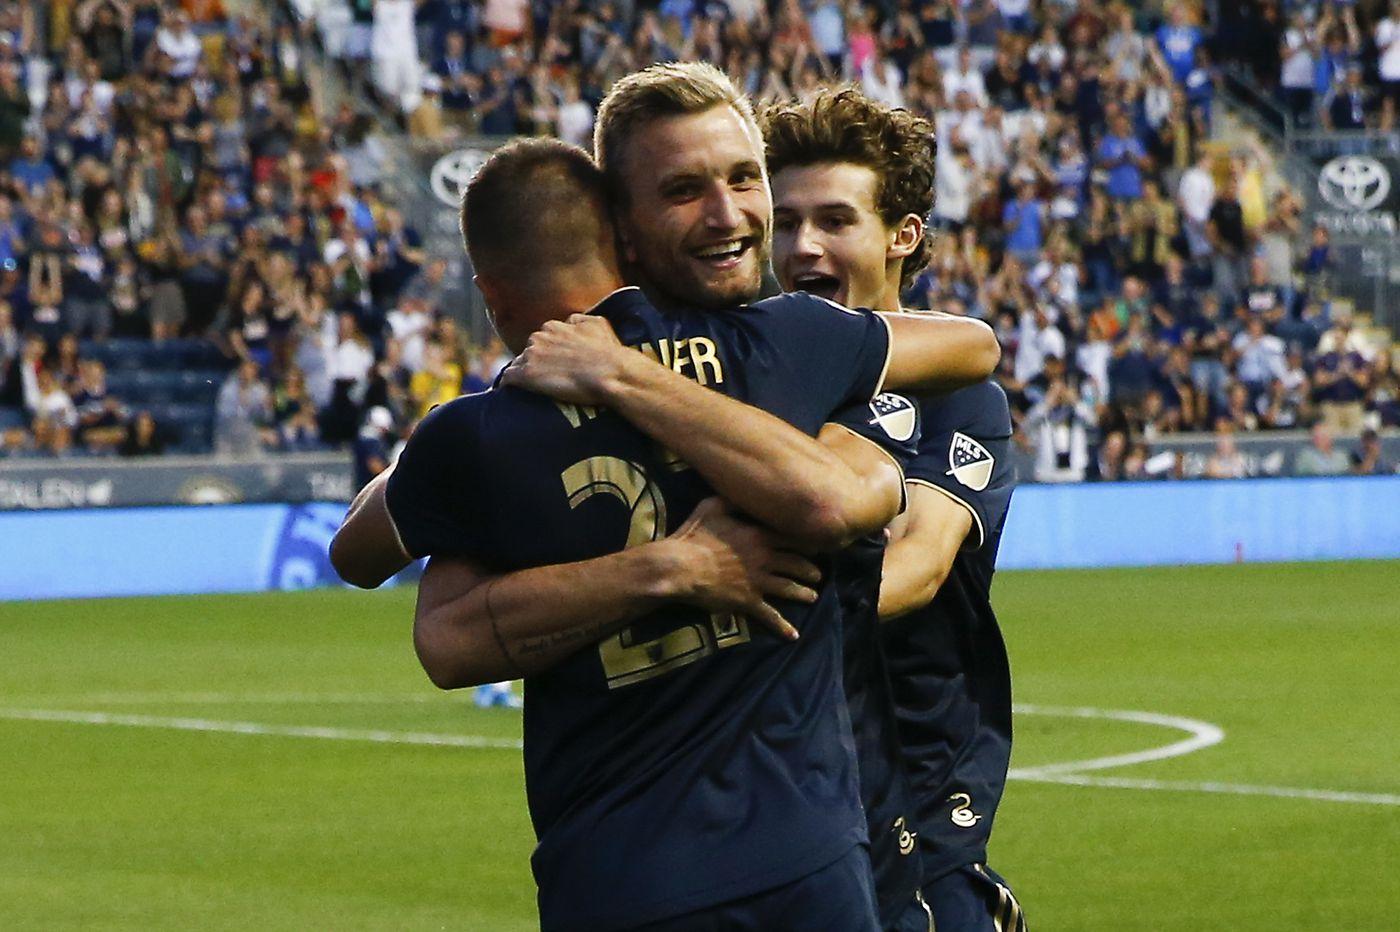 Kacper Przybylko, Brenden Aaronson lead Union to 3-1 win over D.C. United